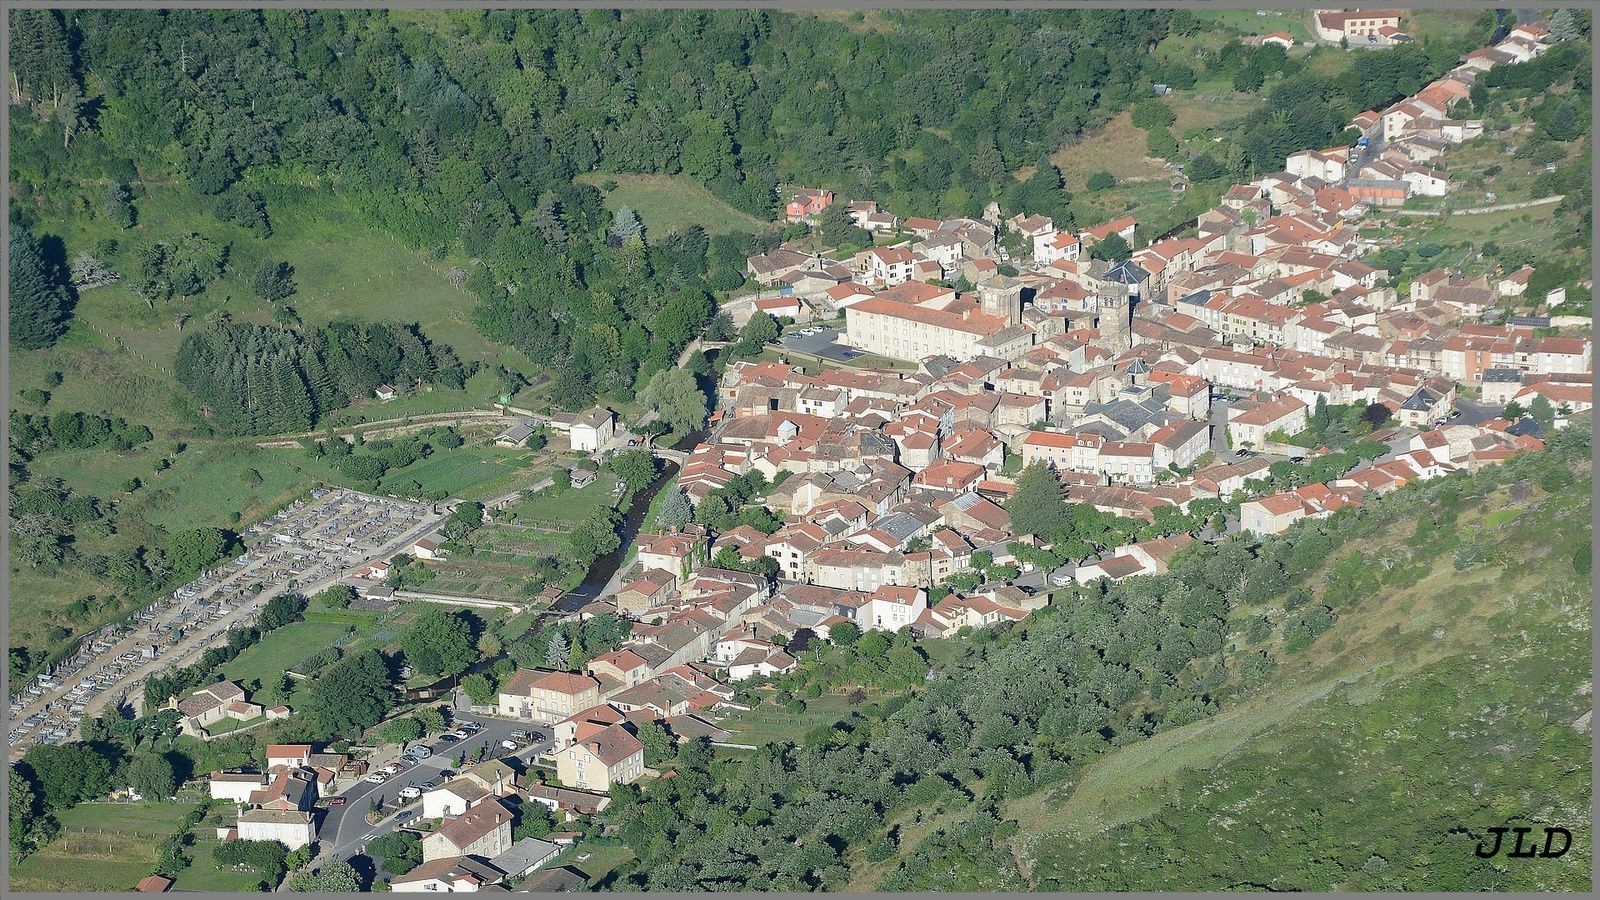 La vallée de l'Allagnon route de Massiac vue du ciel